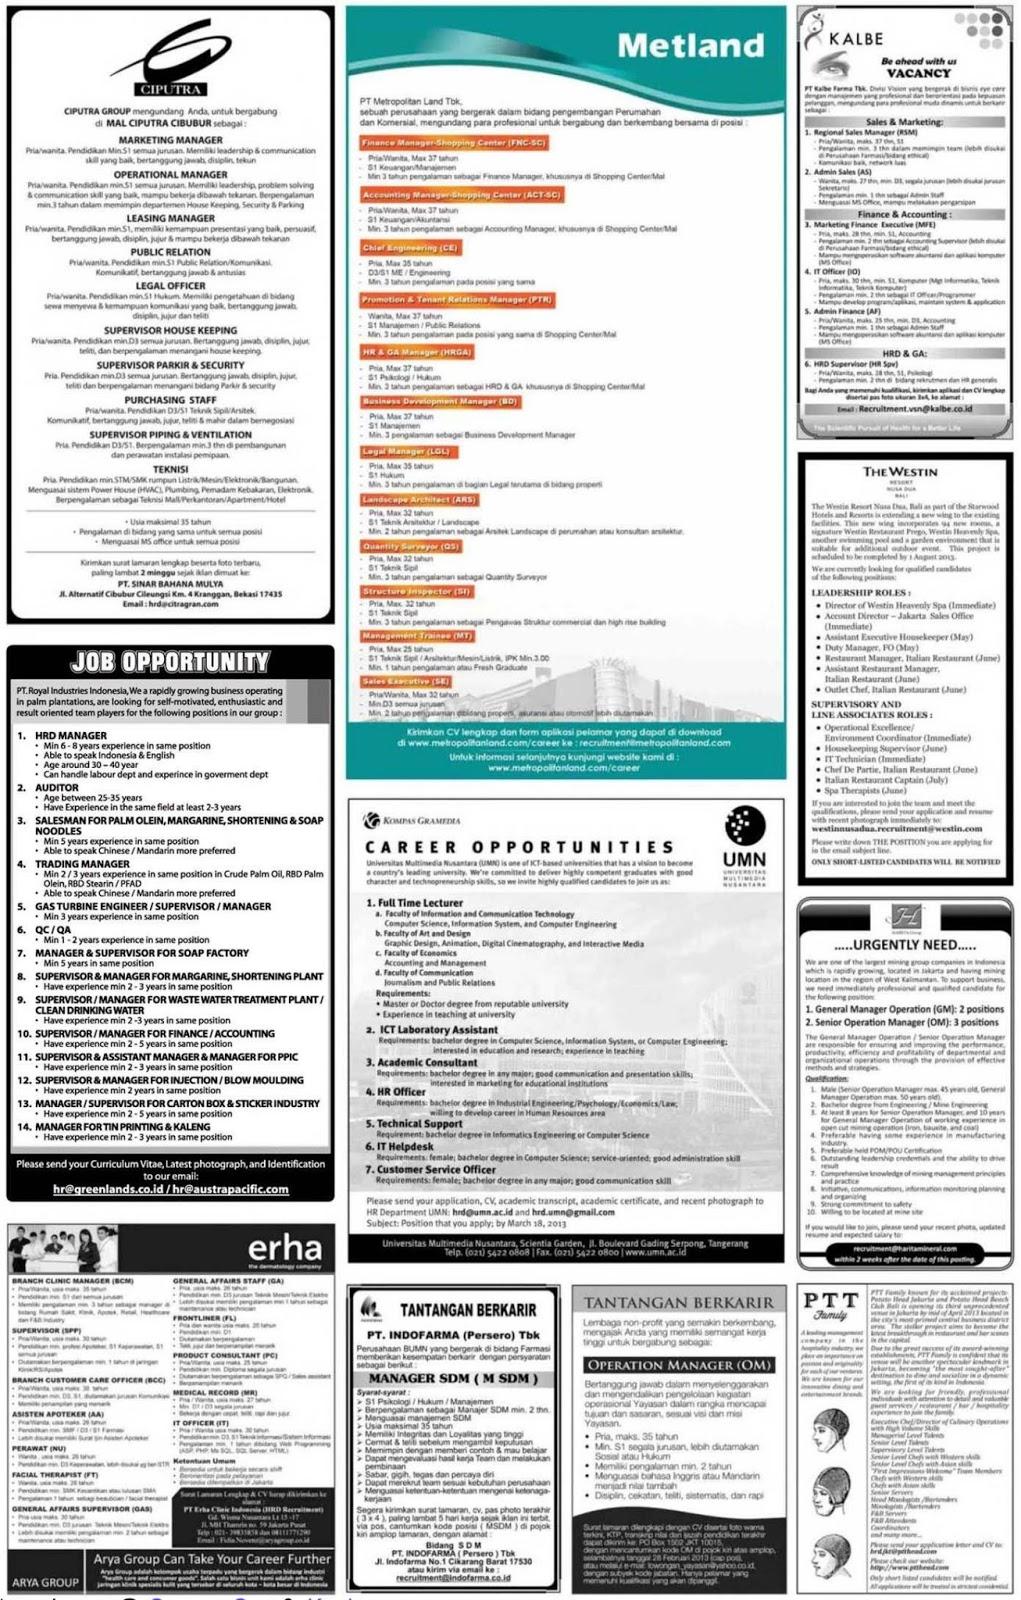 Lowongan Kerja Yogyakarta Februari 2013 Terbaru Portal Info Lowongan Kerja Terbaru Di Solo Raya Kerja Lowongan Kerja 2015 Lowongan Kerja Juni 2015 Lowongan Kerja